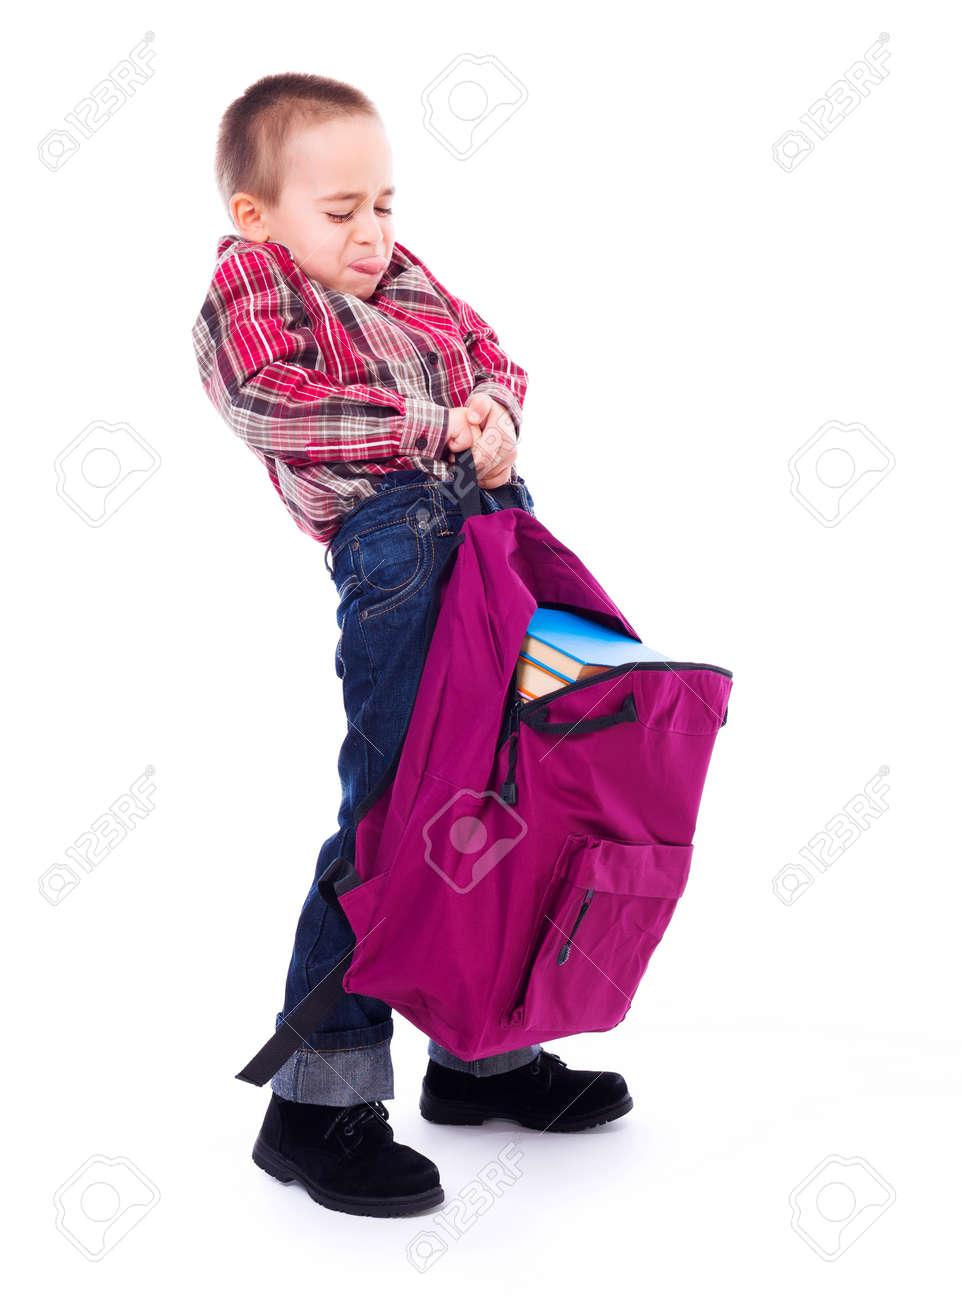 Little boy lifting big, heavy schoolbag full of books - 23955979